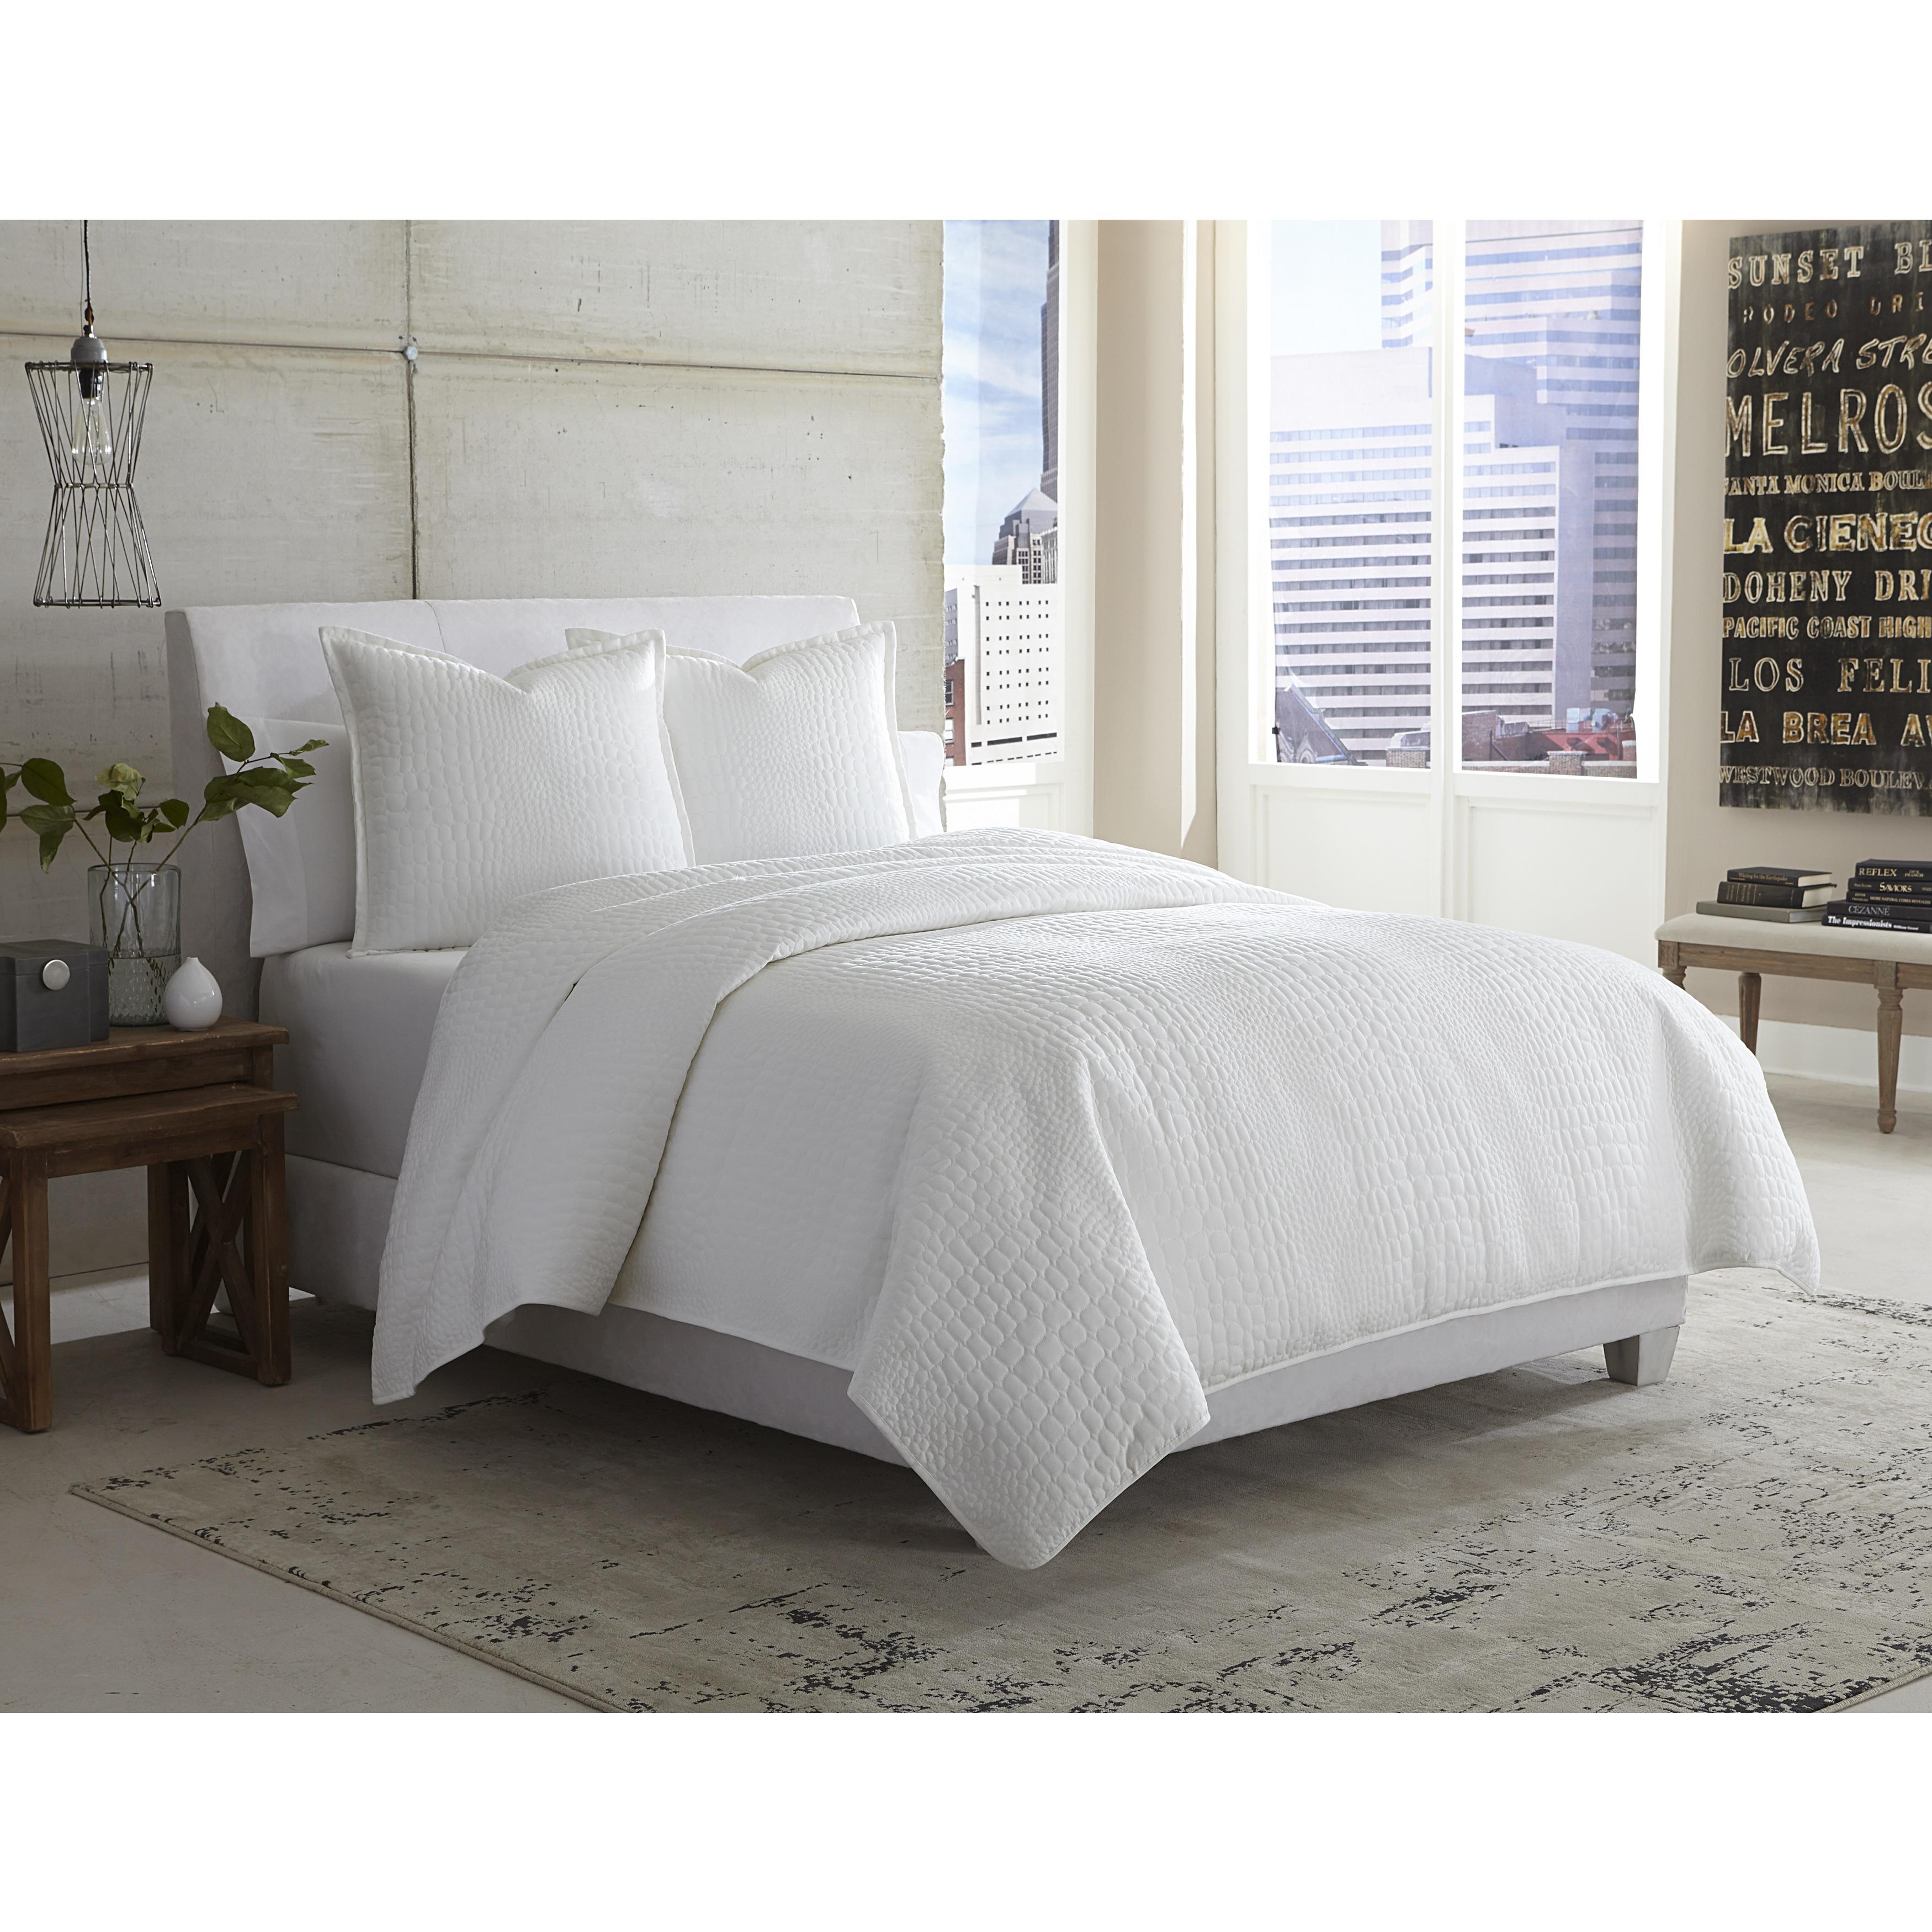 of desks bedding attachment bed amini michael with bedroom minimalist furniture